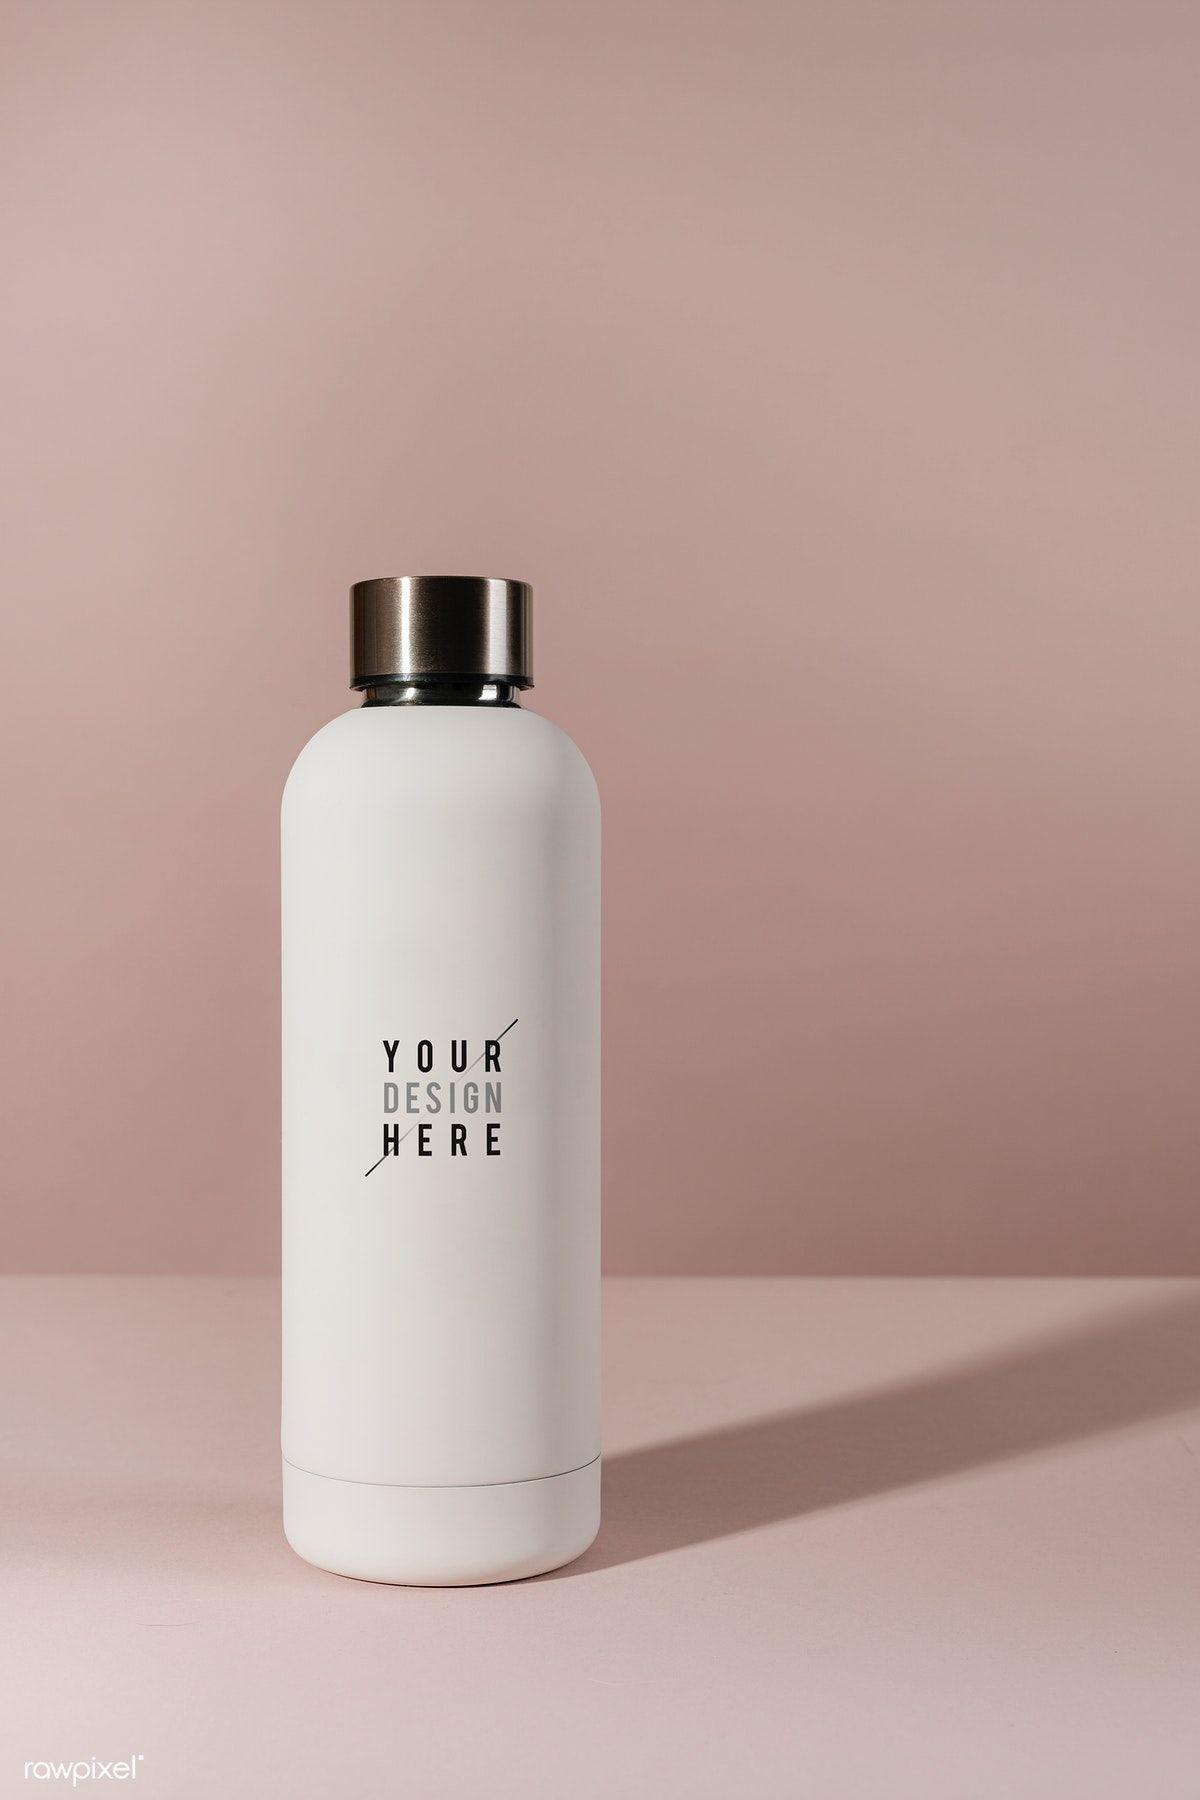 Download Premium Psd Of Minimal Reusable Water Bottle Design Mockup 2253985 Reusable Water Bottle Design Water Bottle Design Mockup Design